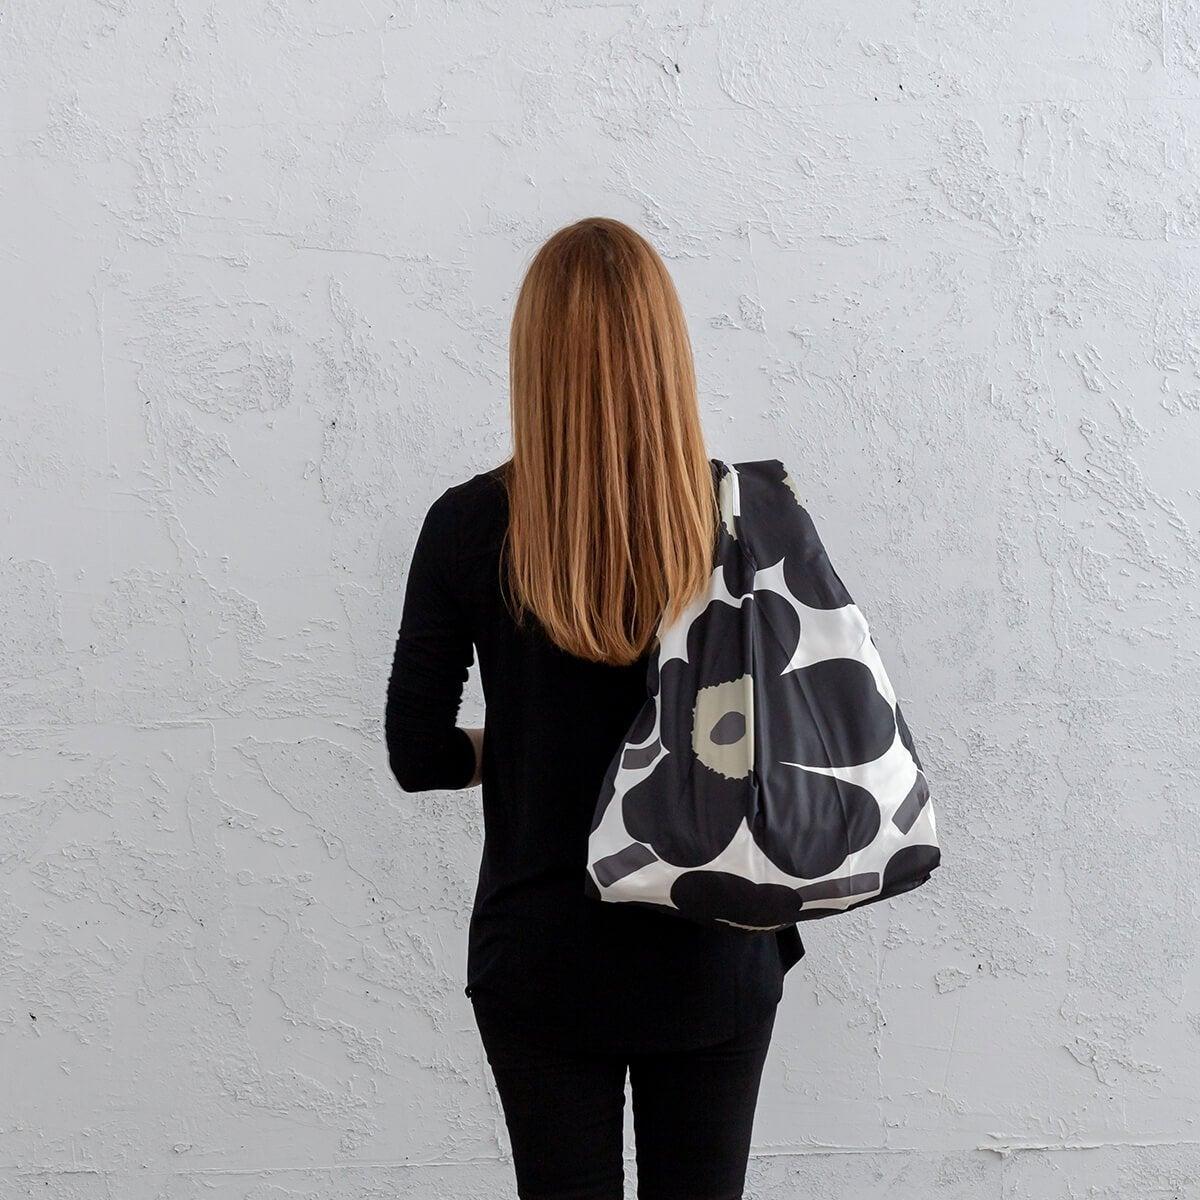 MARIMEKKO - PIENI UNIKKO SMART BAG - WHITE + BLACK + OLIVE